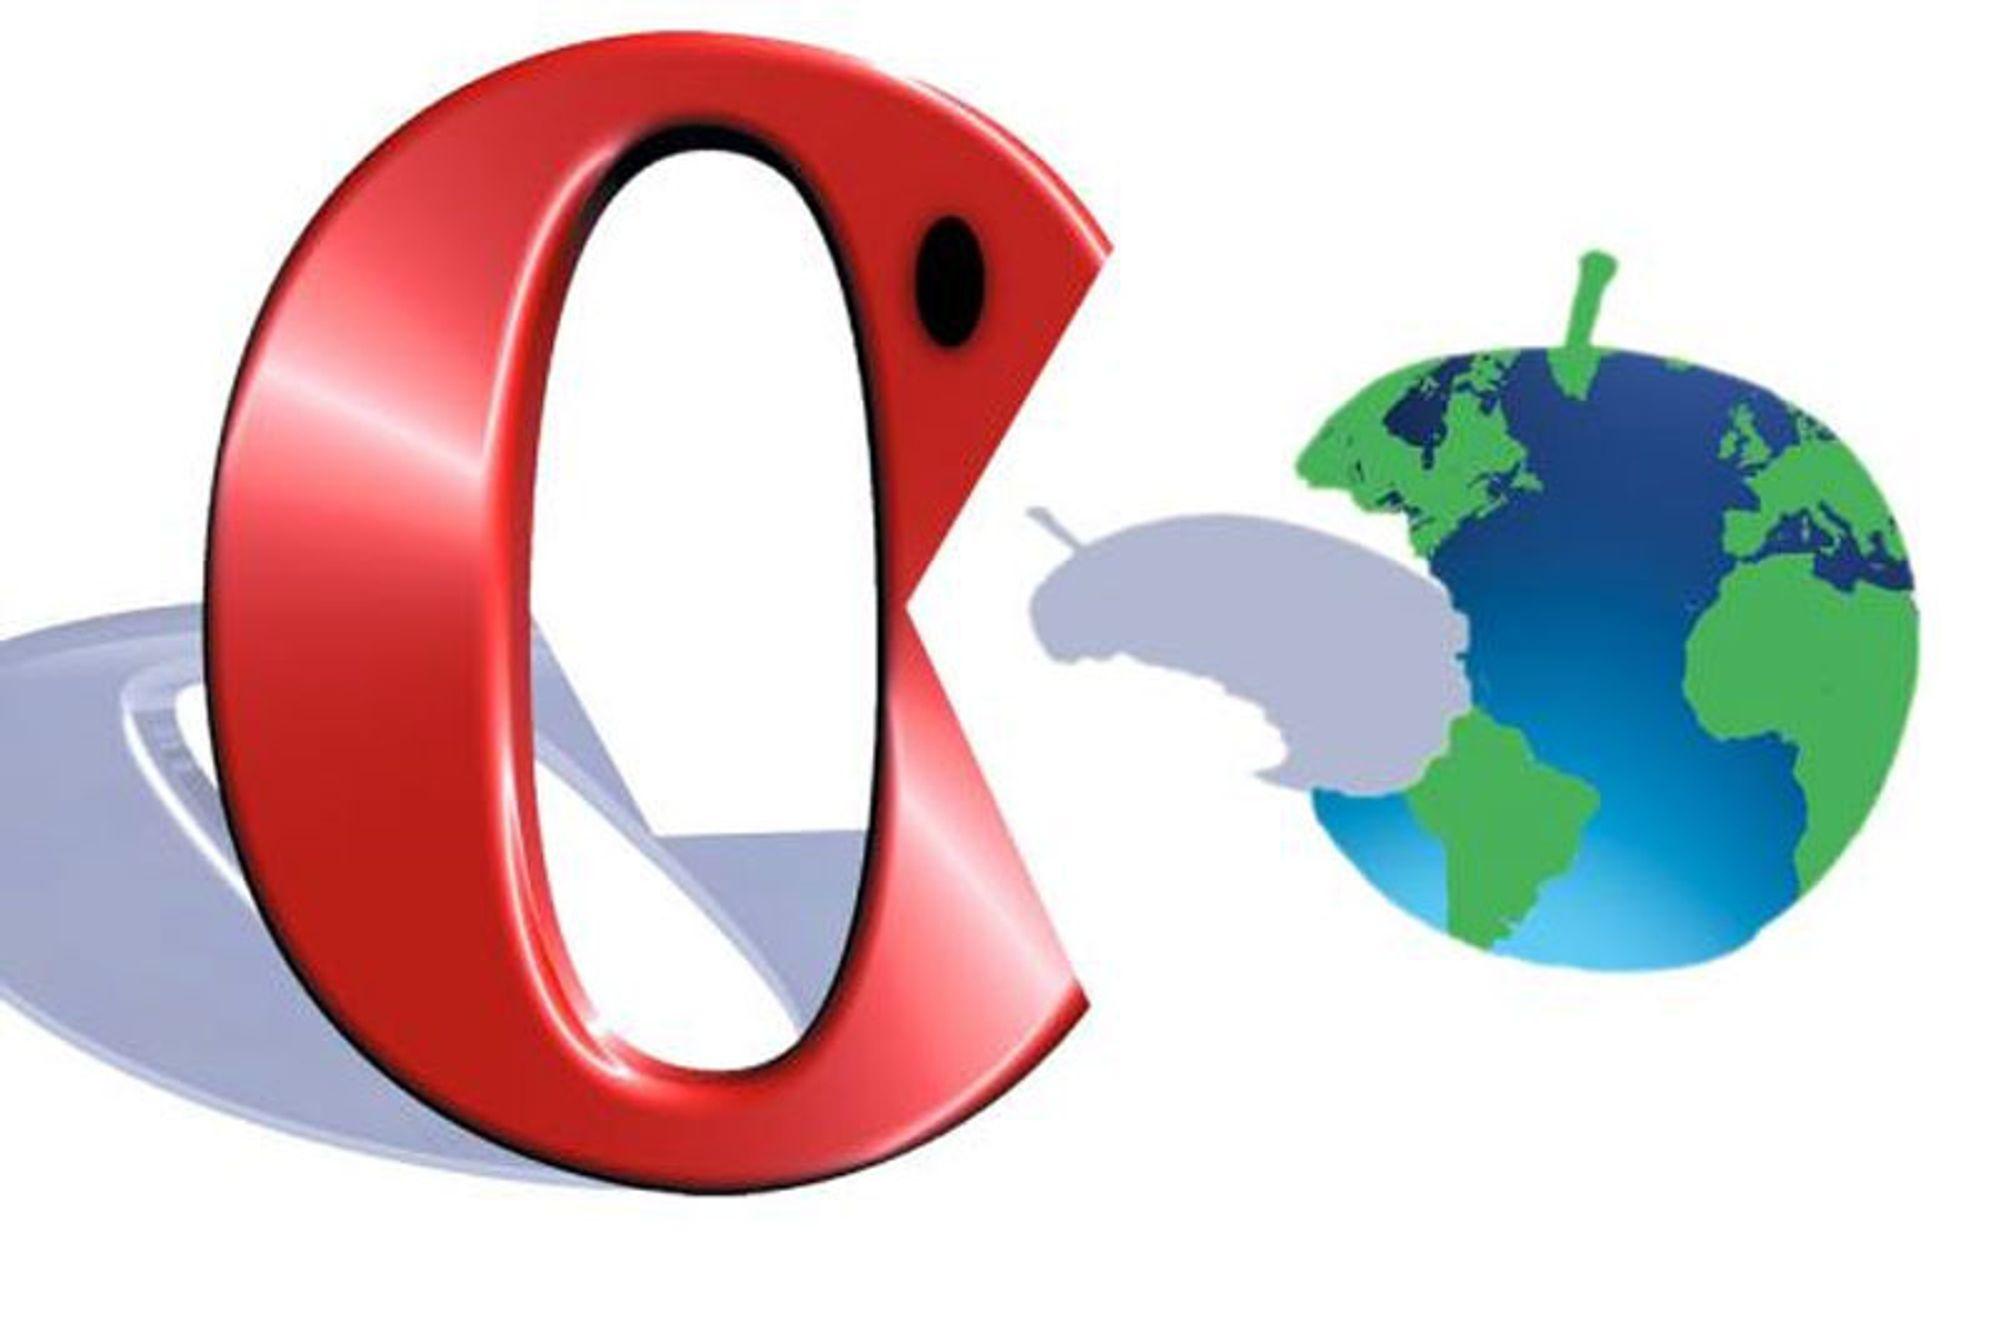 Opera inntar appenes verden